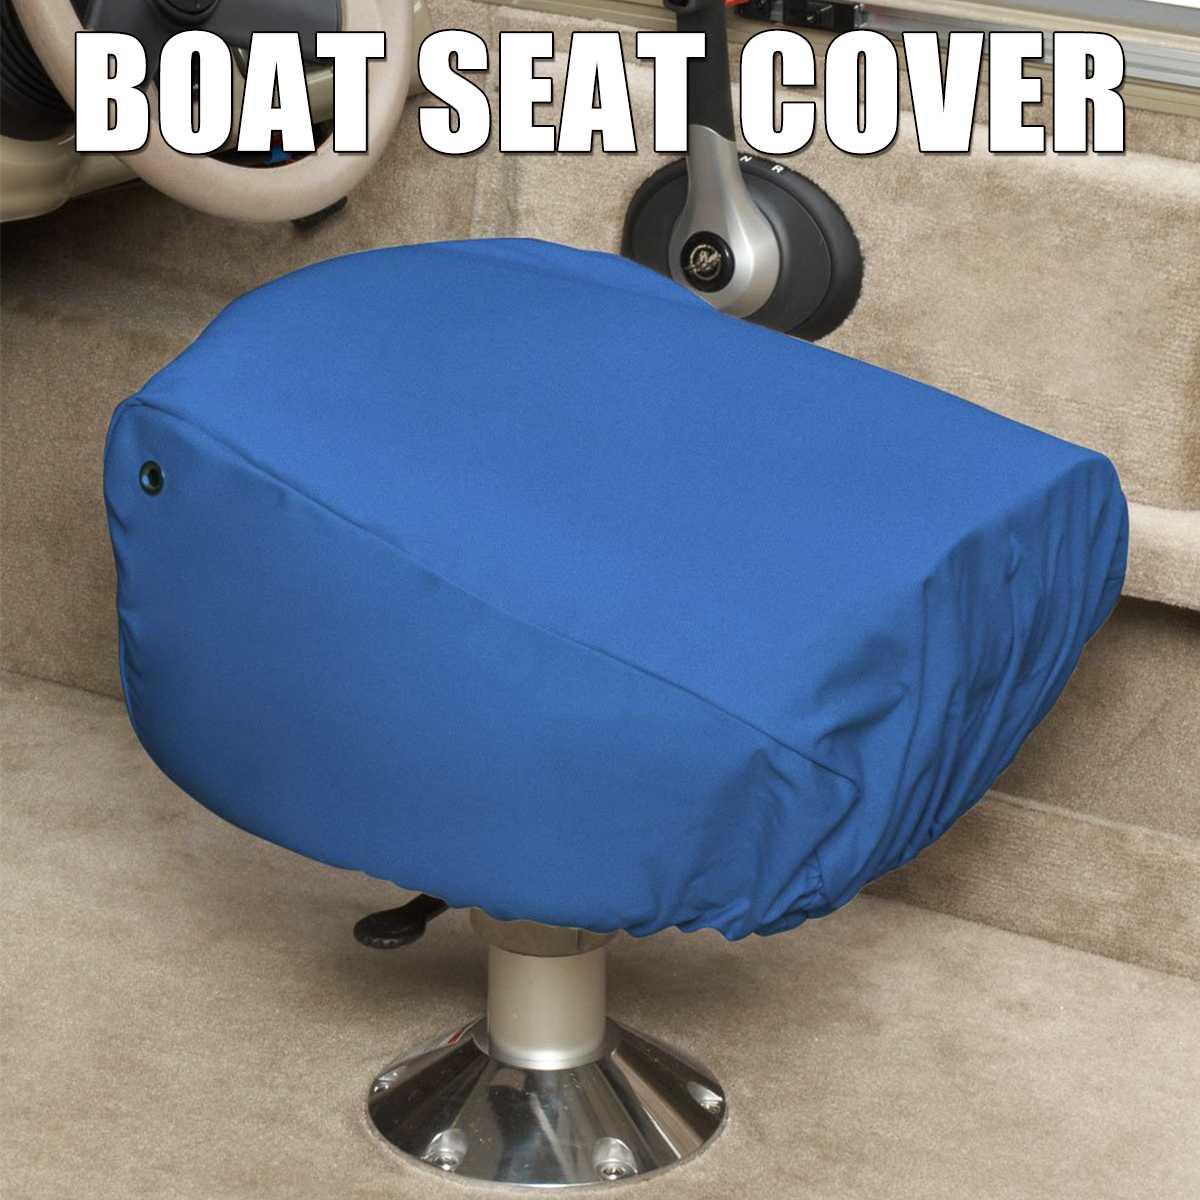 Bootssitze Abdeckung Yacht Kapit/än Stuhl Cover Wasserdicht Anti-UV Polyester Flexibel Gummizug 56x61x64cm Grau